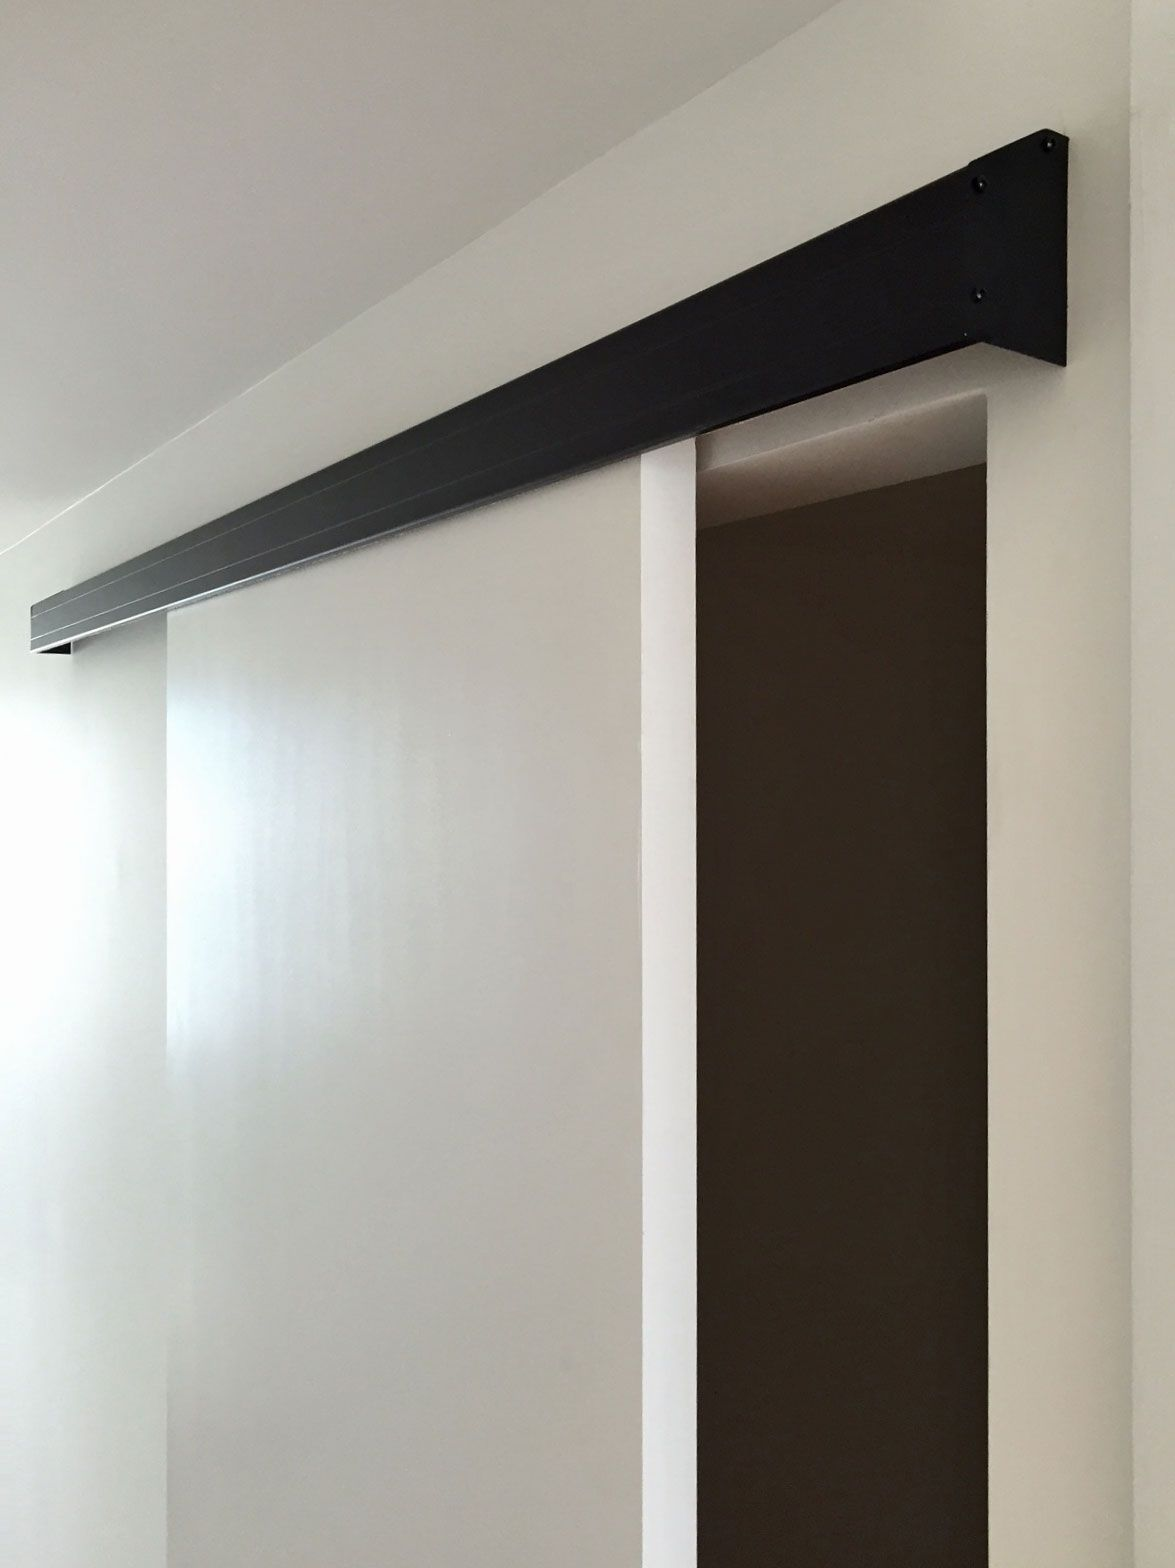 Black Wall Mount Track Cavity Sliding Doors Sliding Door Track